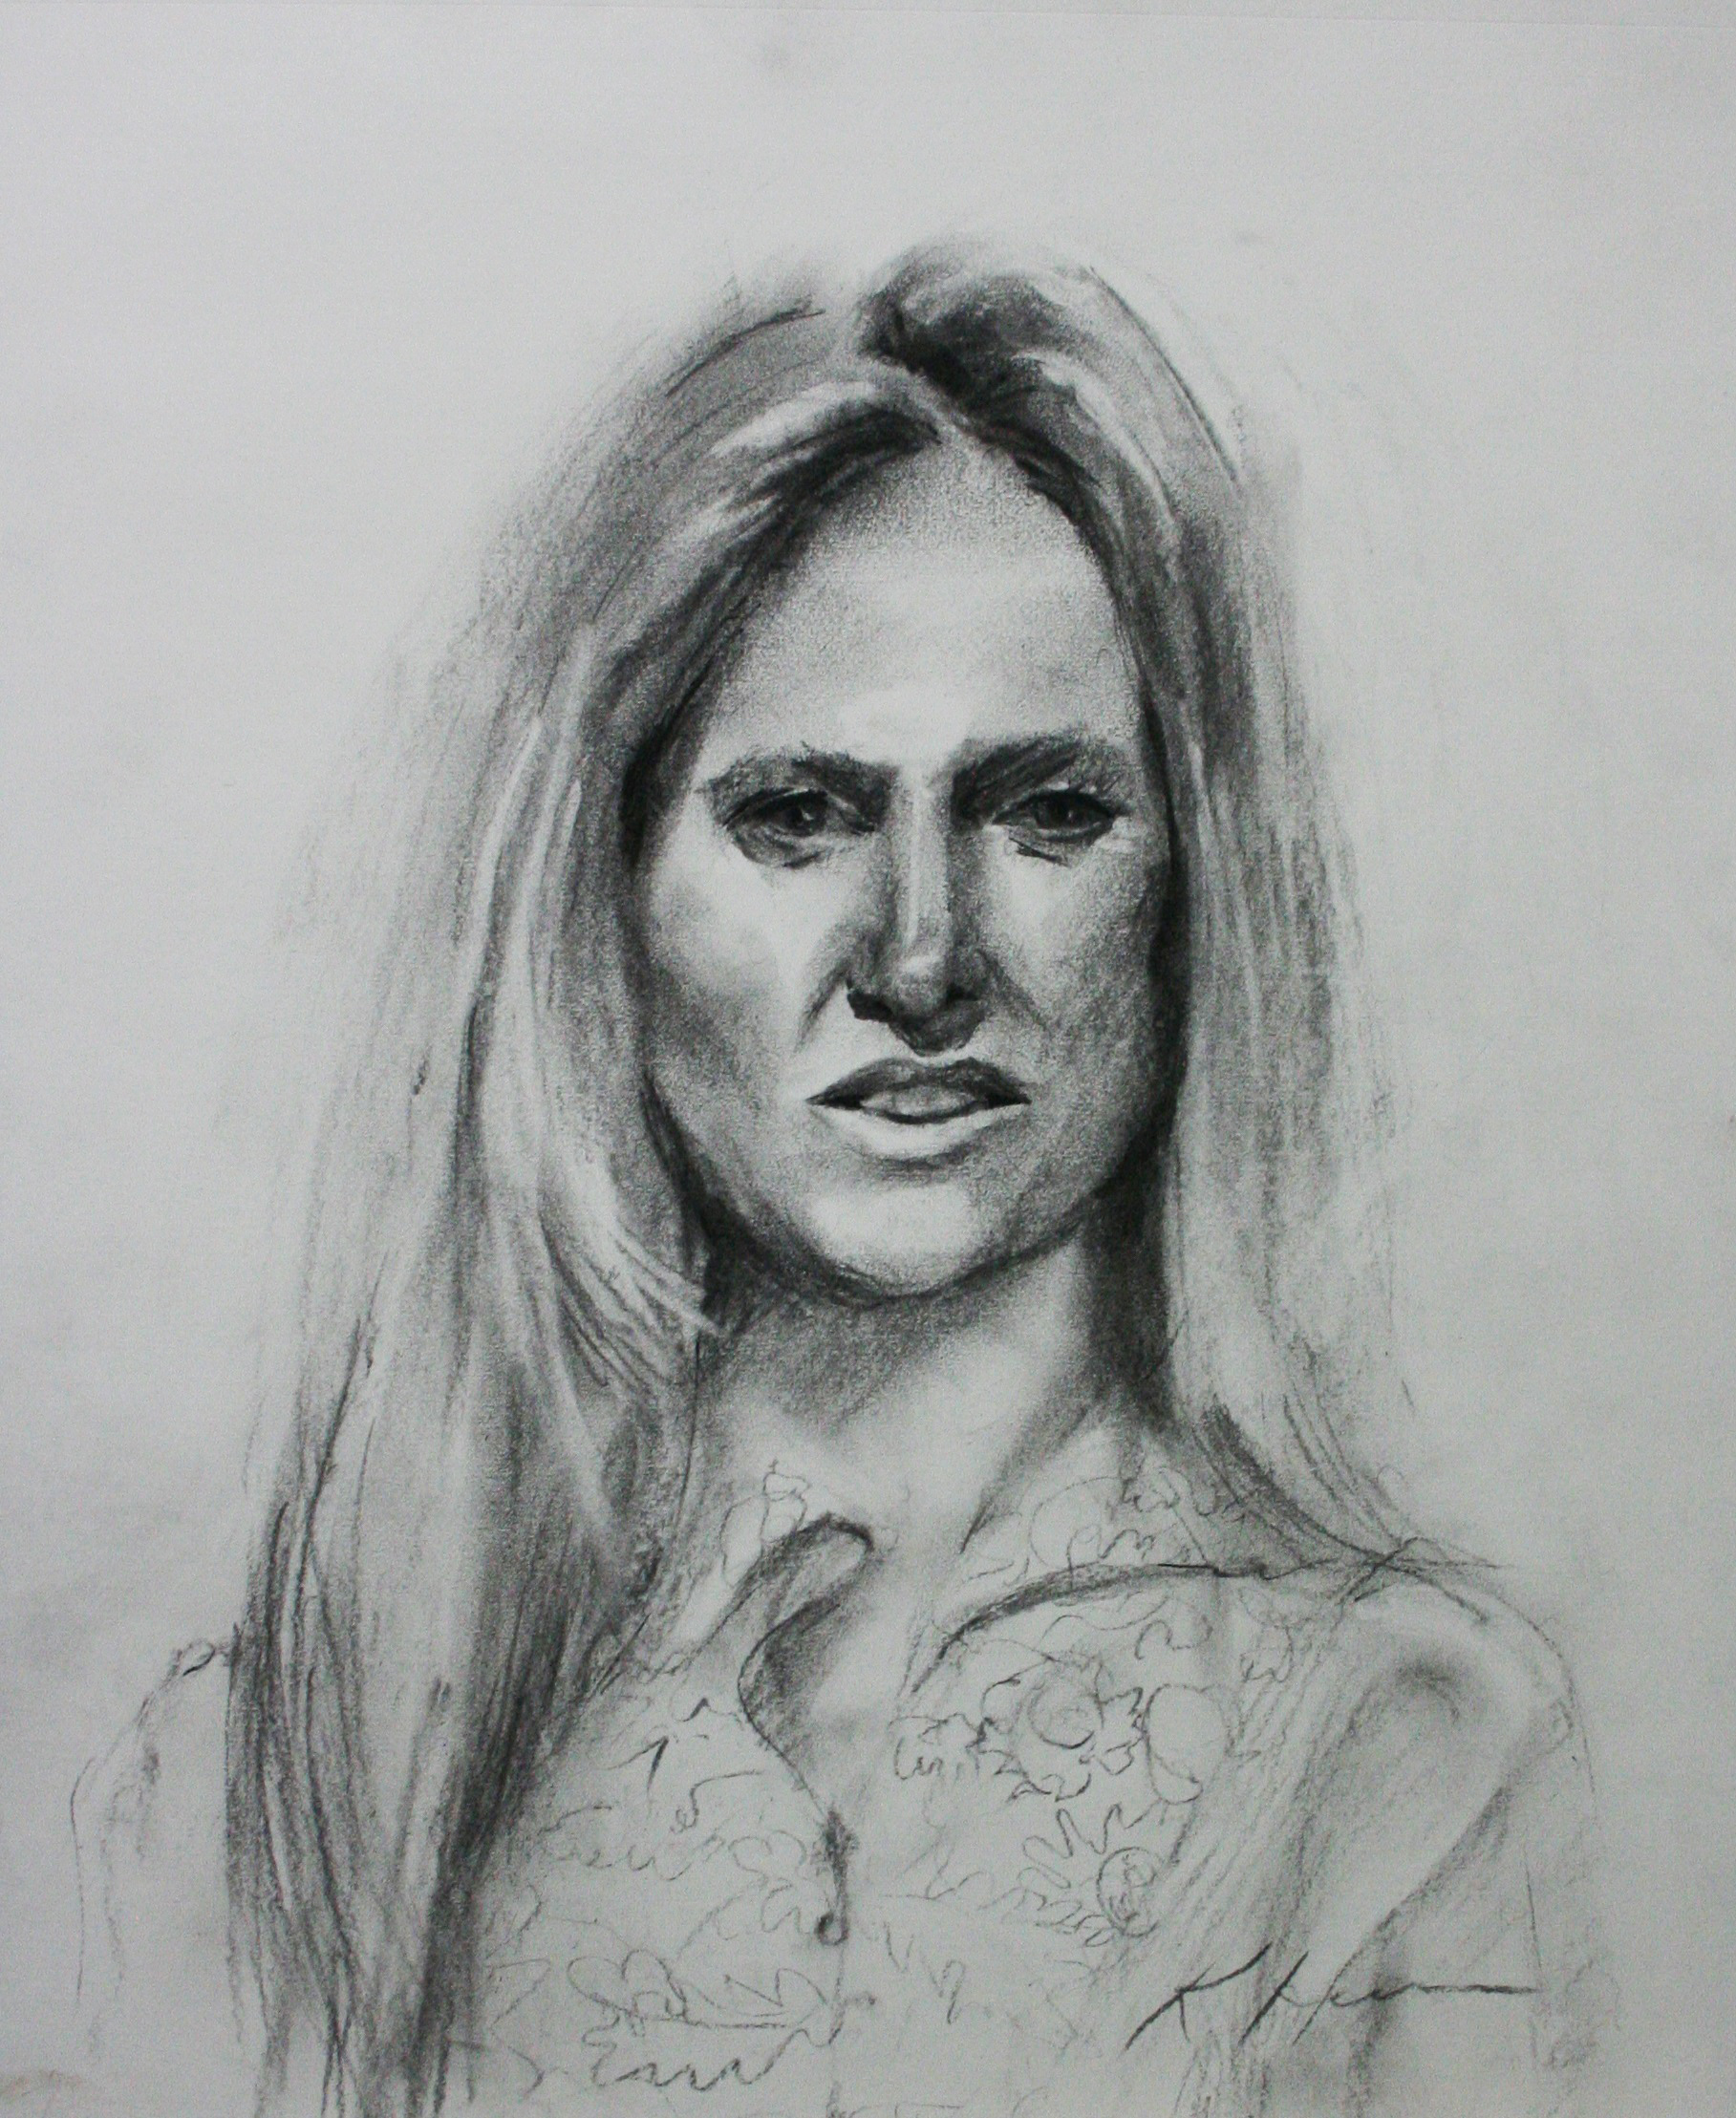 Kathryn Heim did this hour sketch.